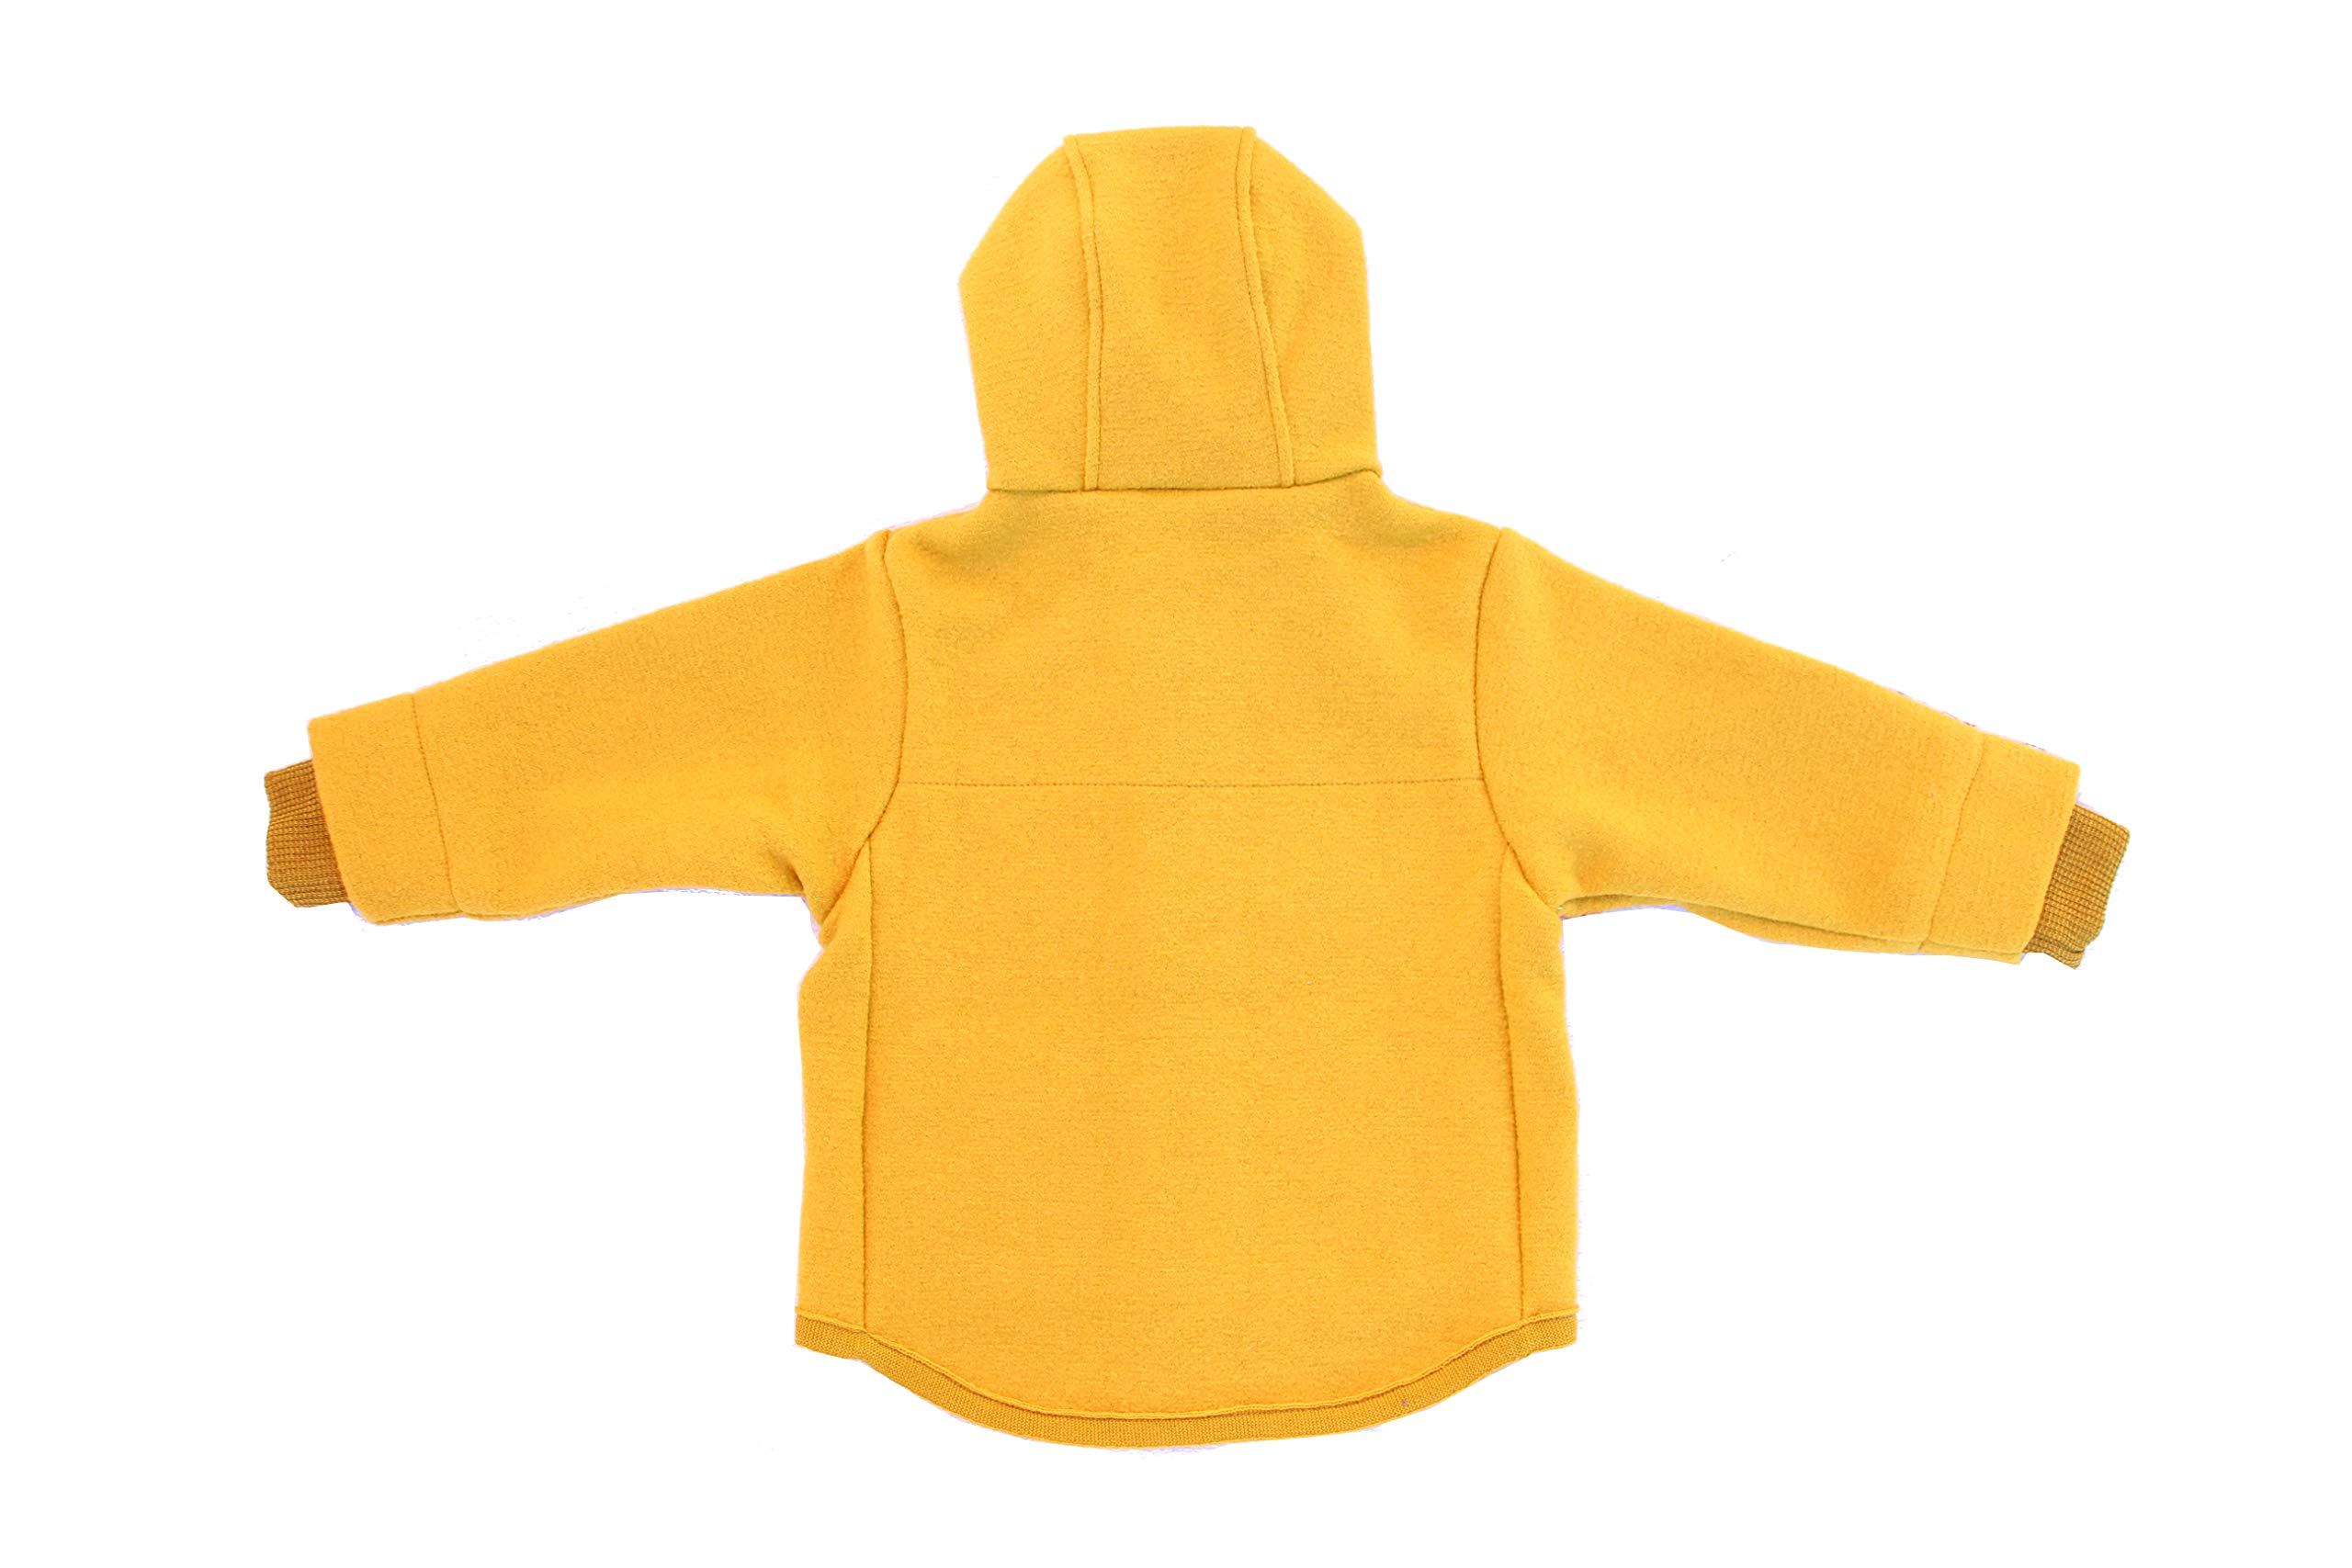 Disana Walk Chaqueta 3221 100% lana virgen, forro 100% algodón 2